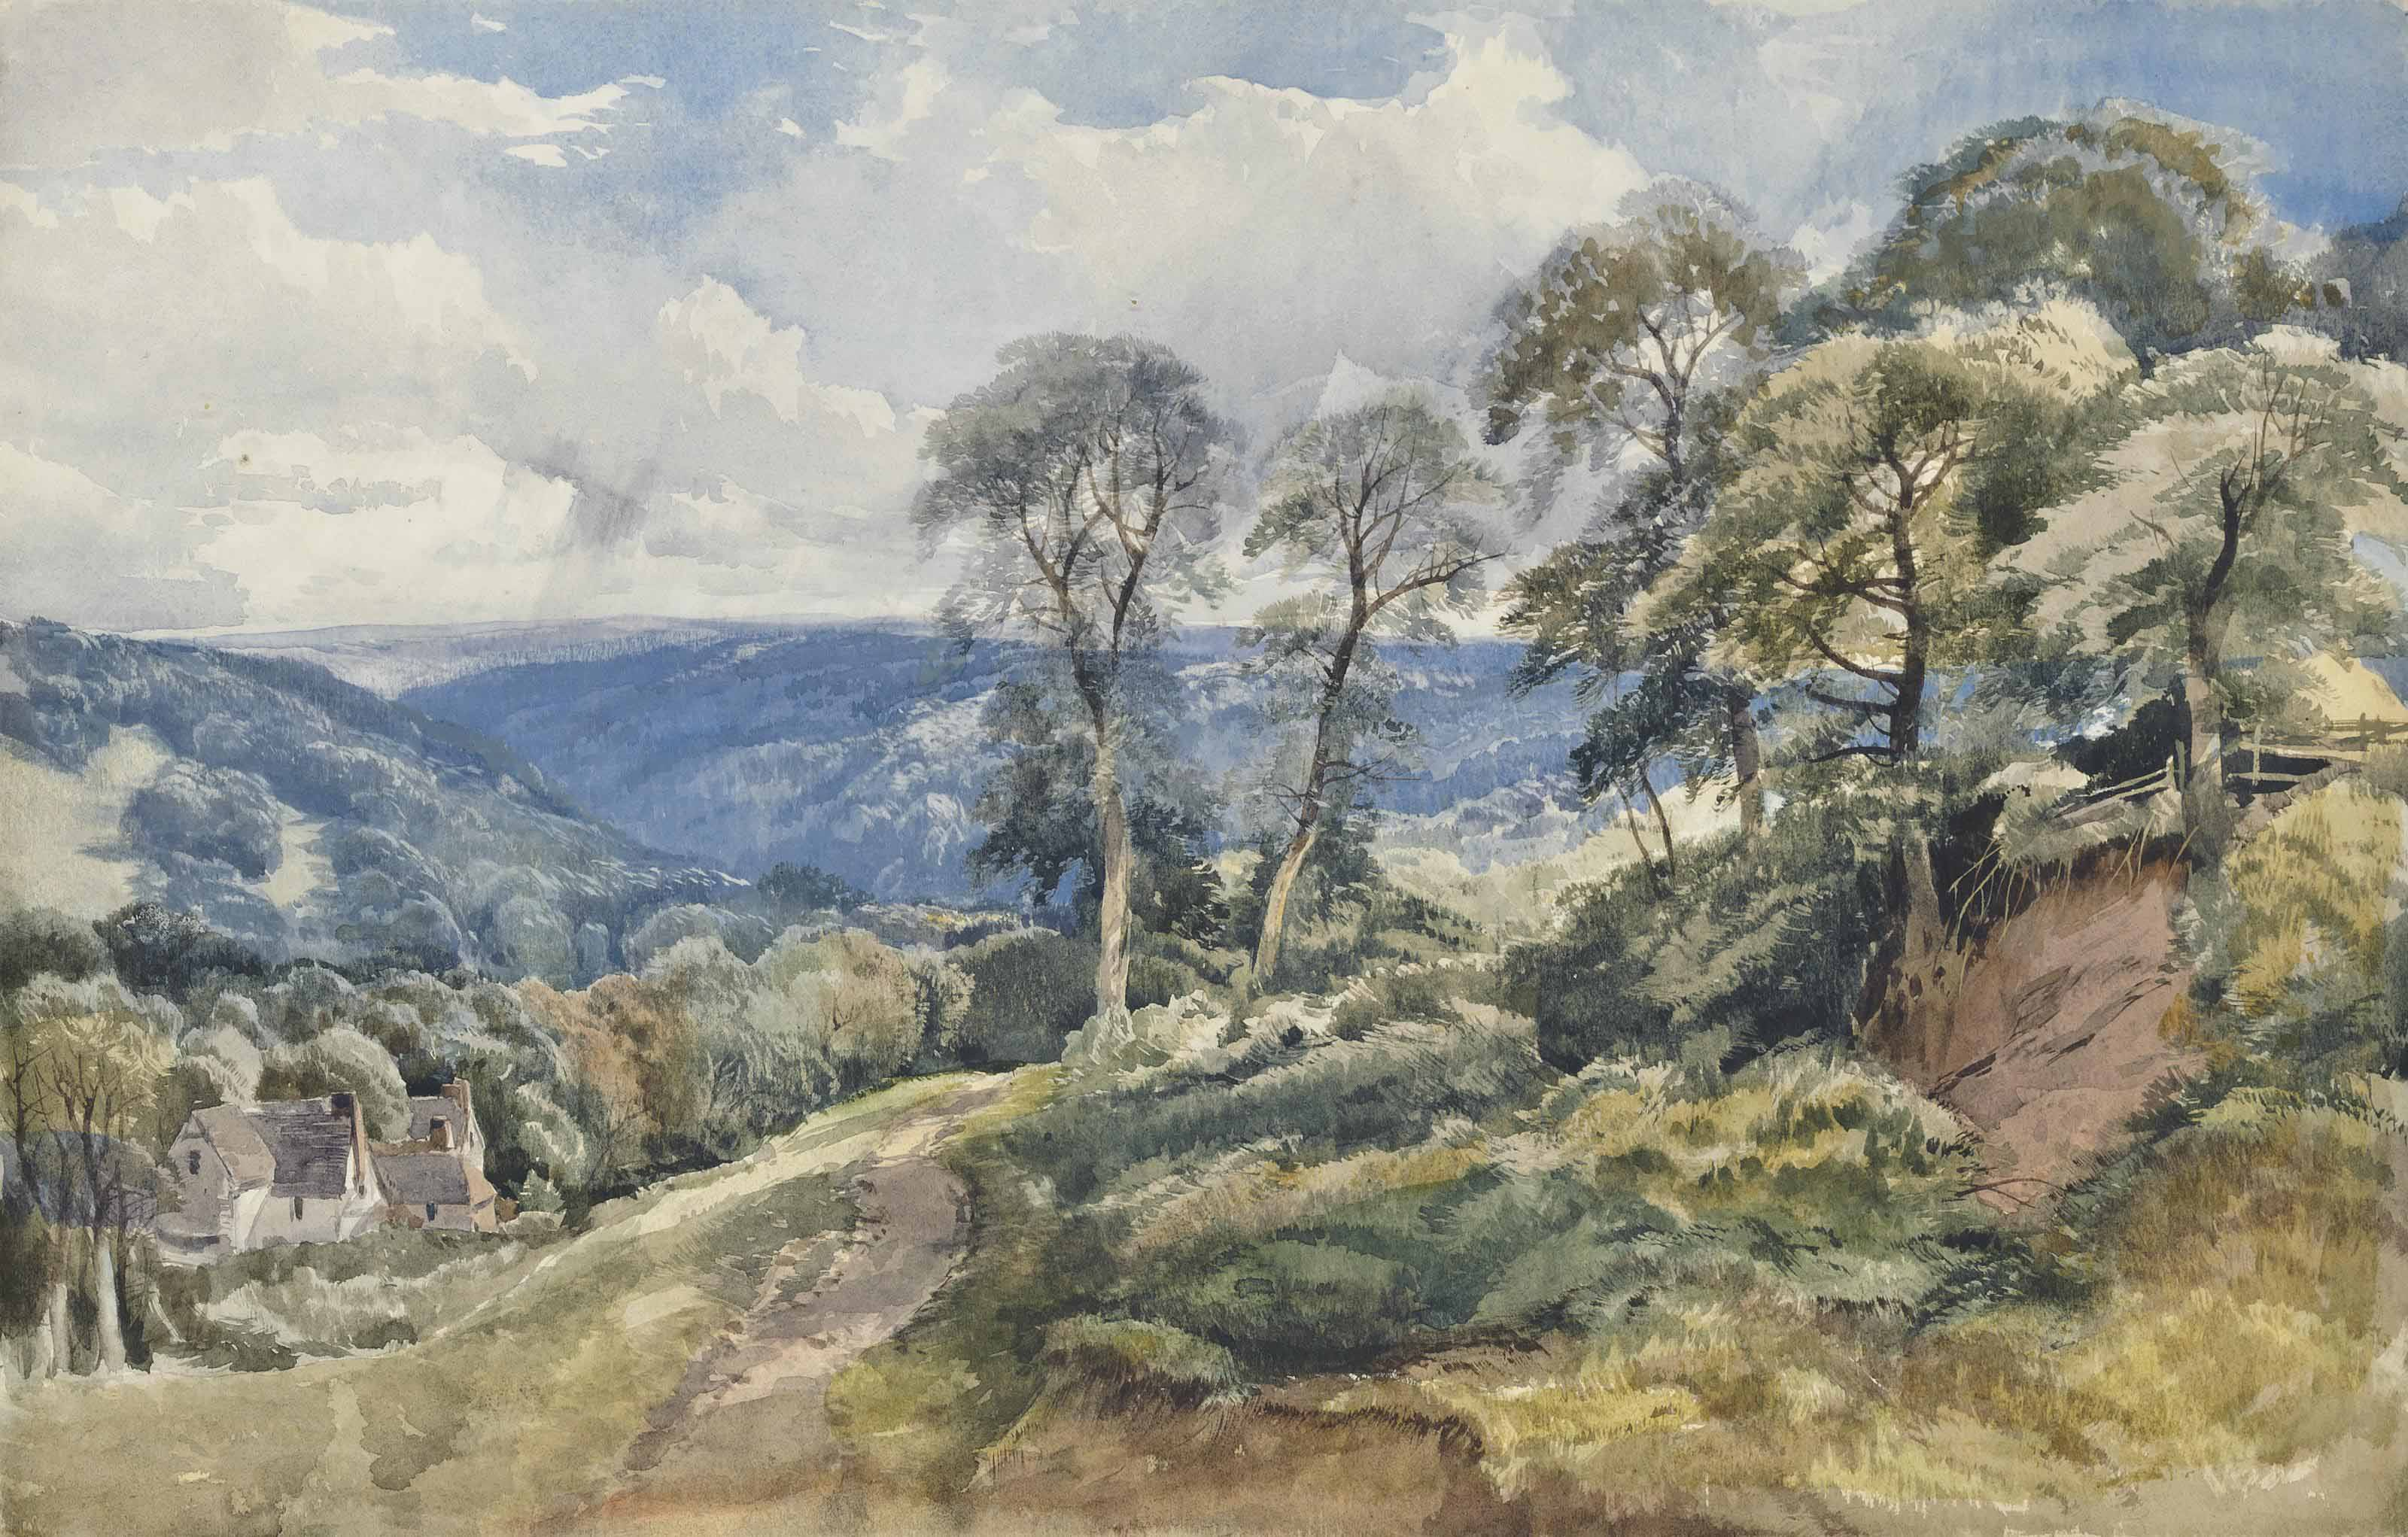 Ivybridge, Devon; Buckhurst Farm, Sussex; and A wooded landscape